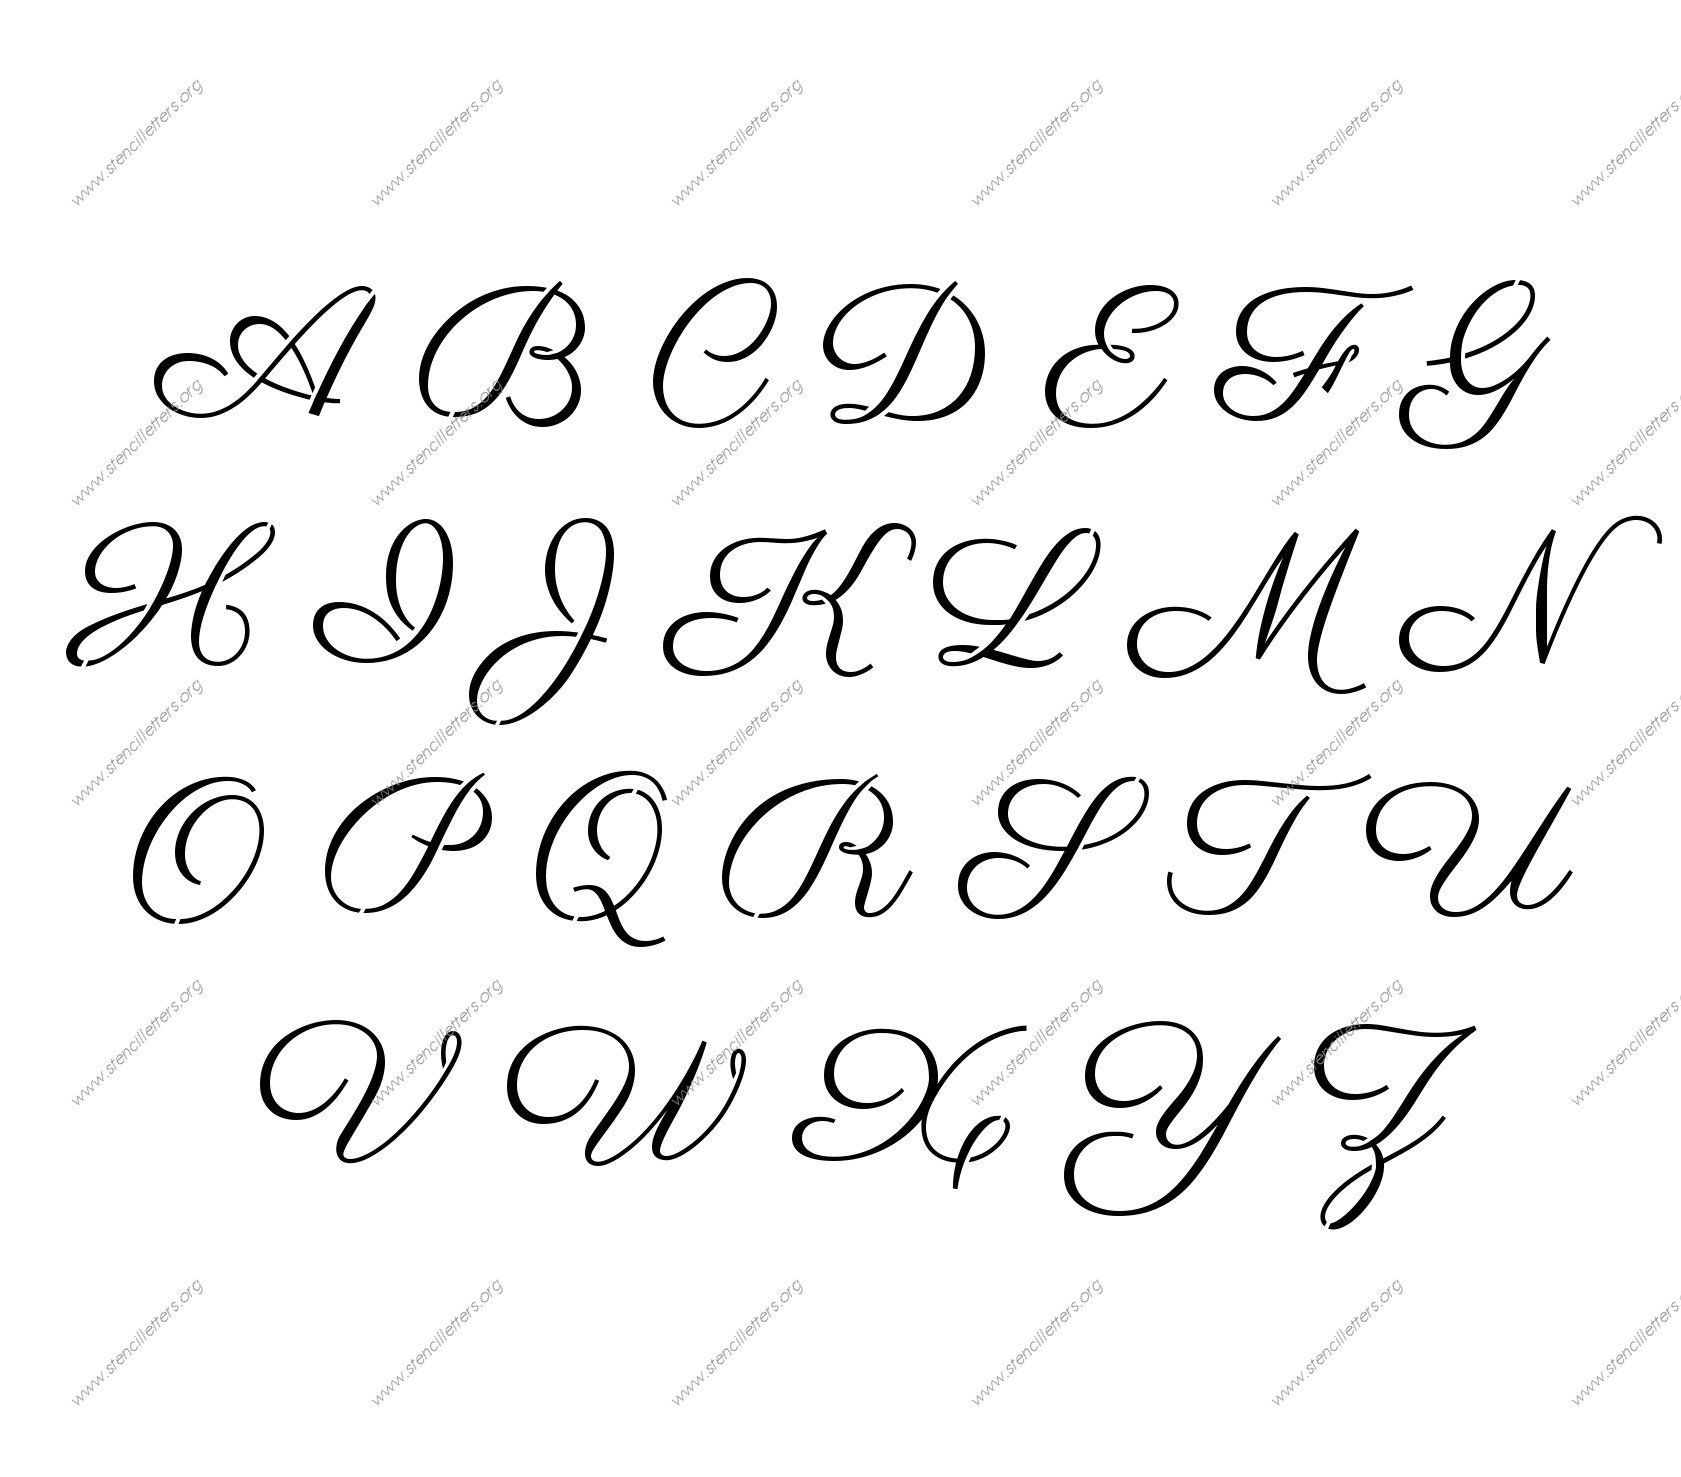 Free Printable Alphabet Stencil Letters Template | Art & Crafts - Free Printable Disney Alphabet Letters